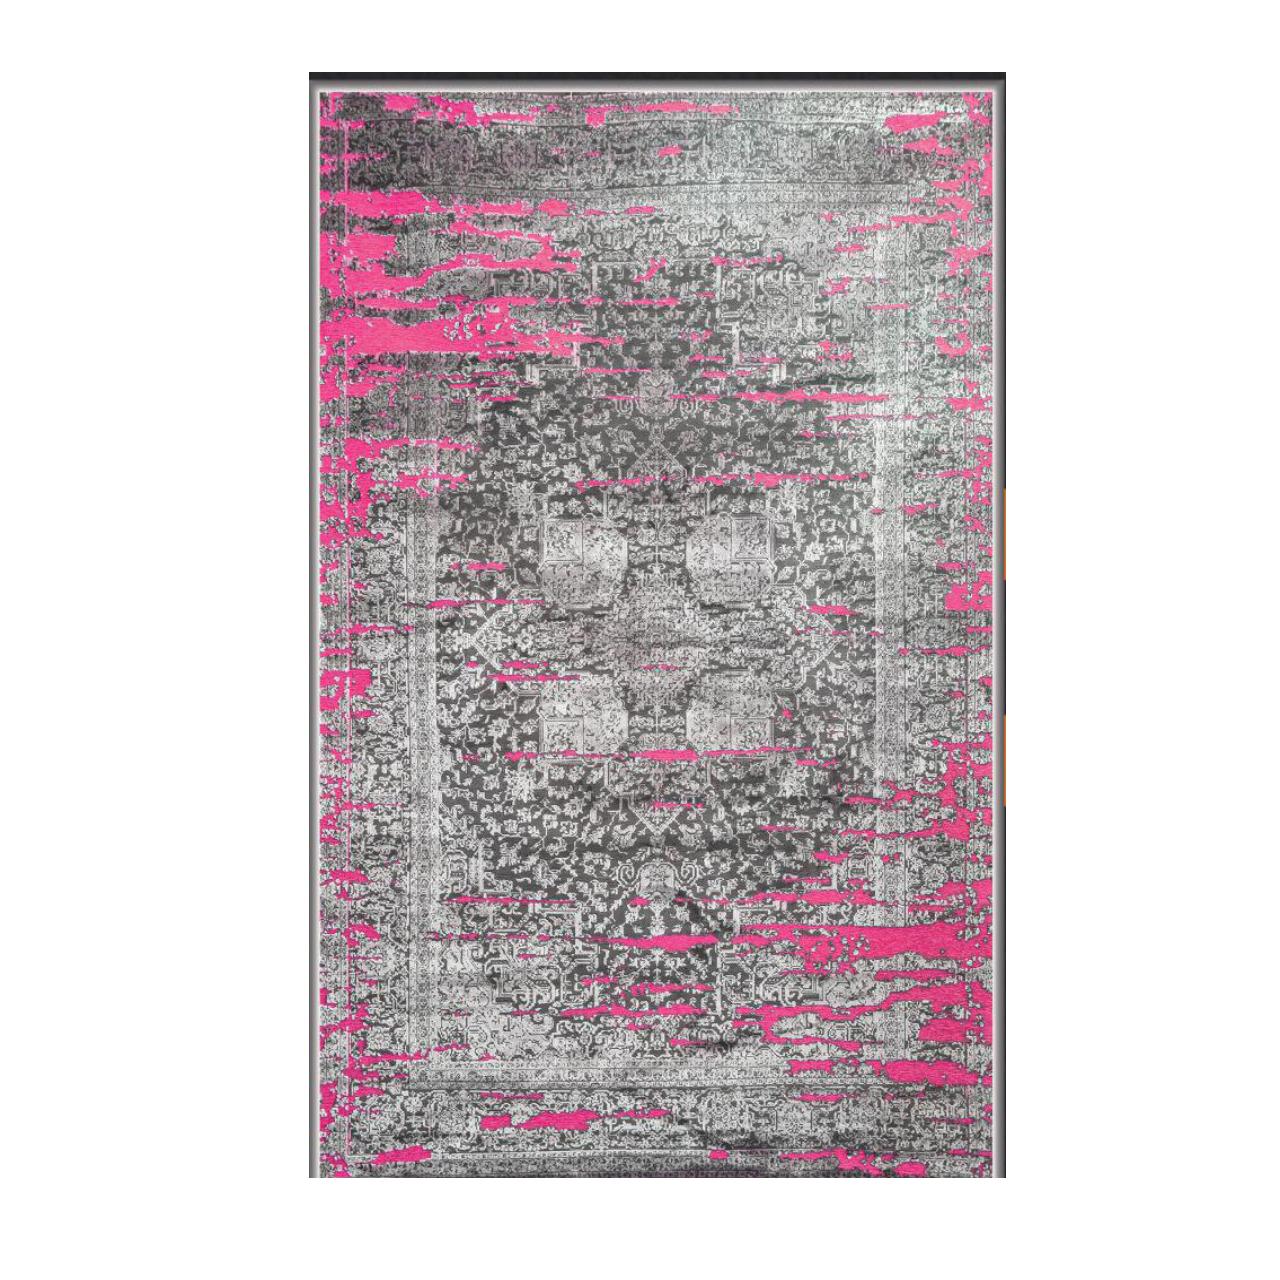 فرش ماشینی طرح پتینه کد2013 زمینه طوسی صورتی